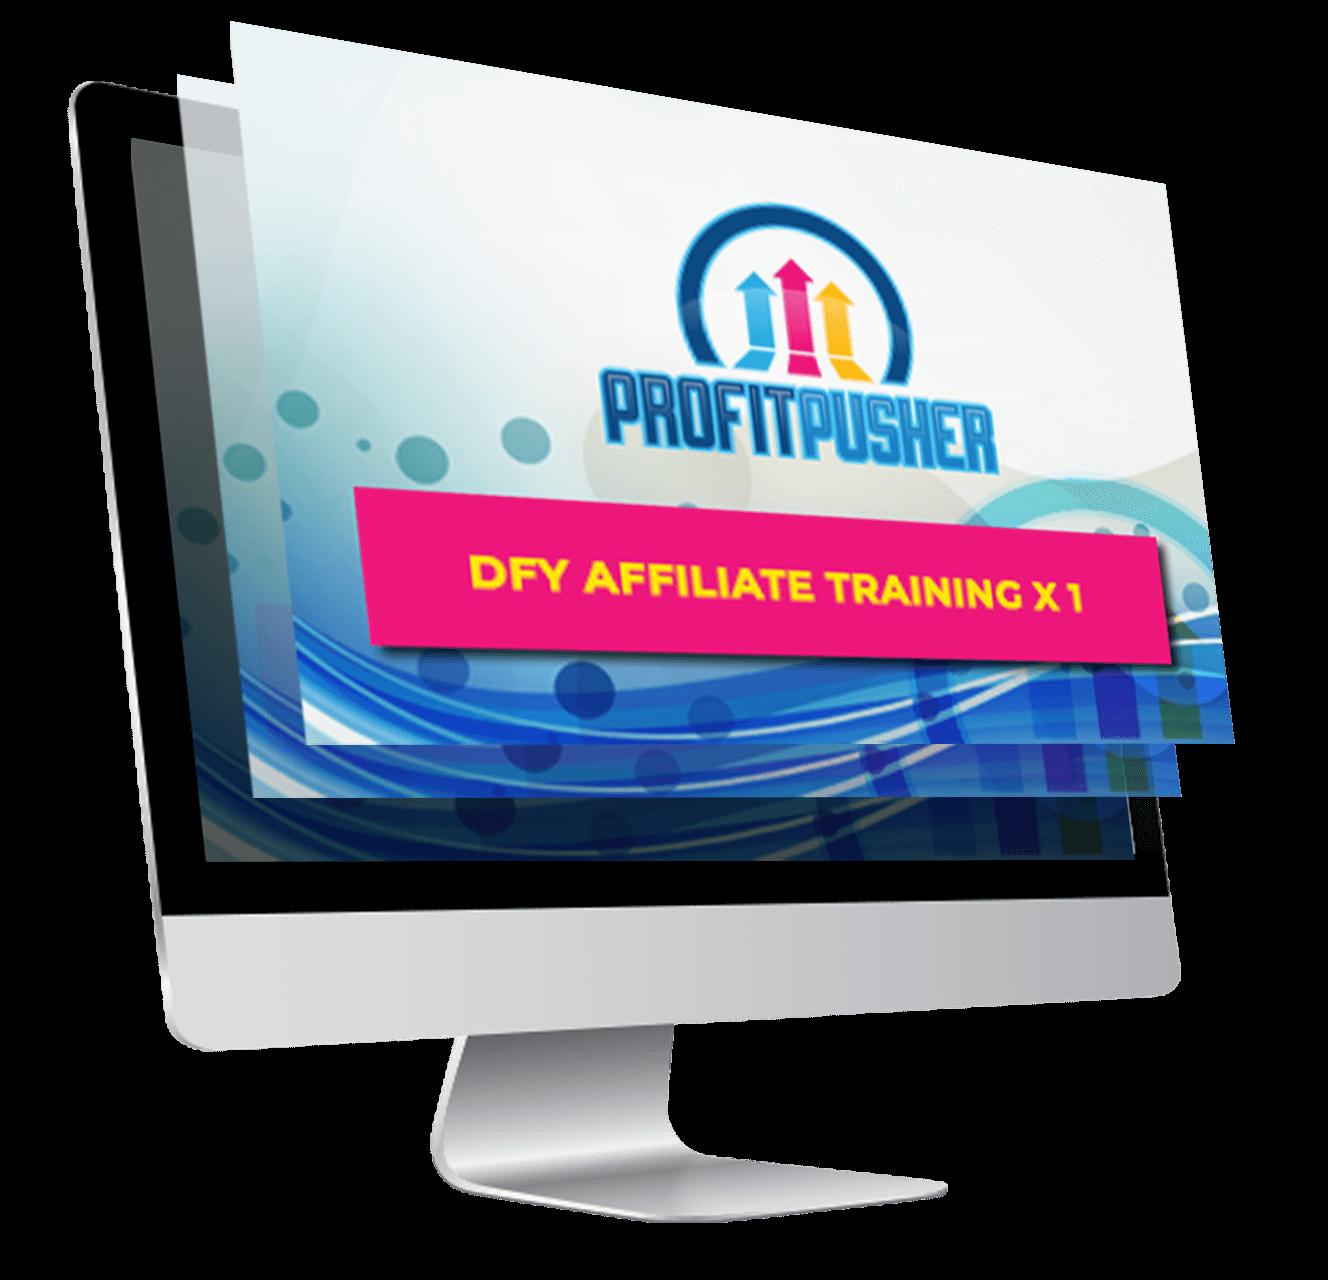 Profit-Pusher-feature-6